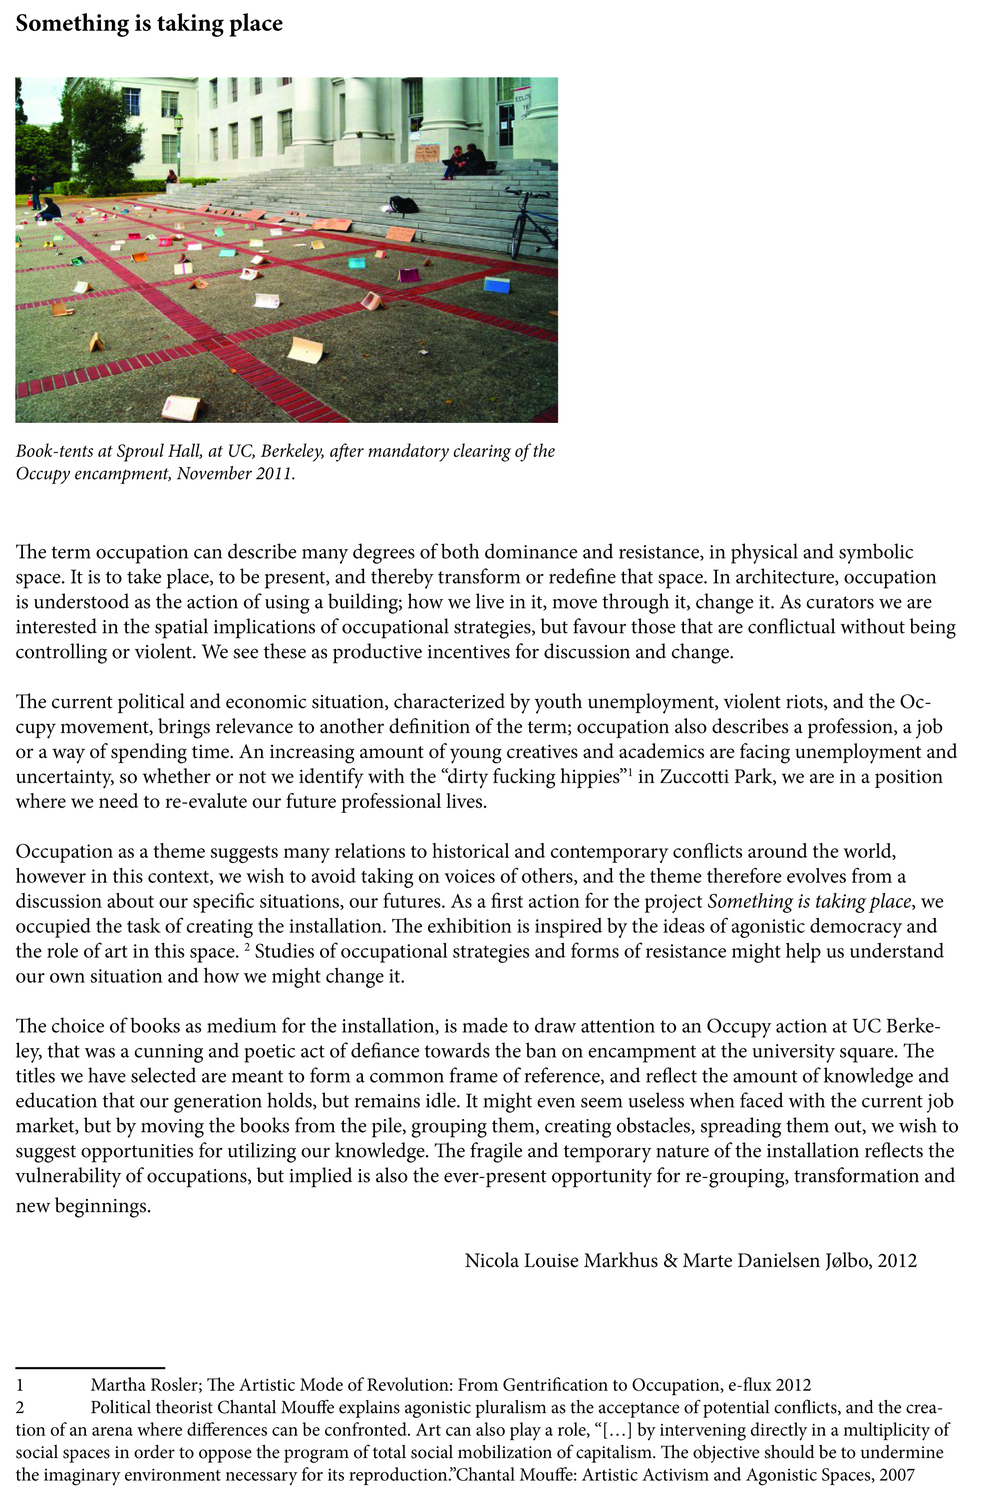 Curatorial-Statement_final1-1-copy.jpg